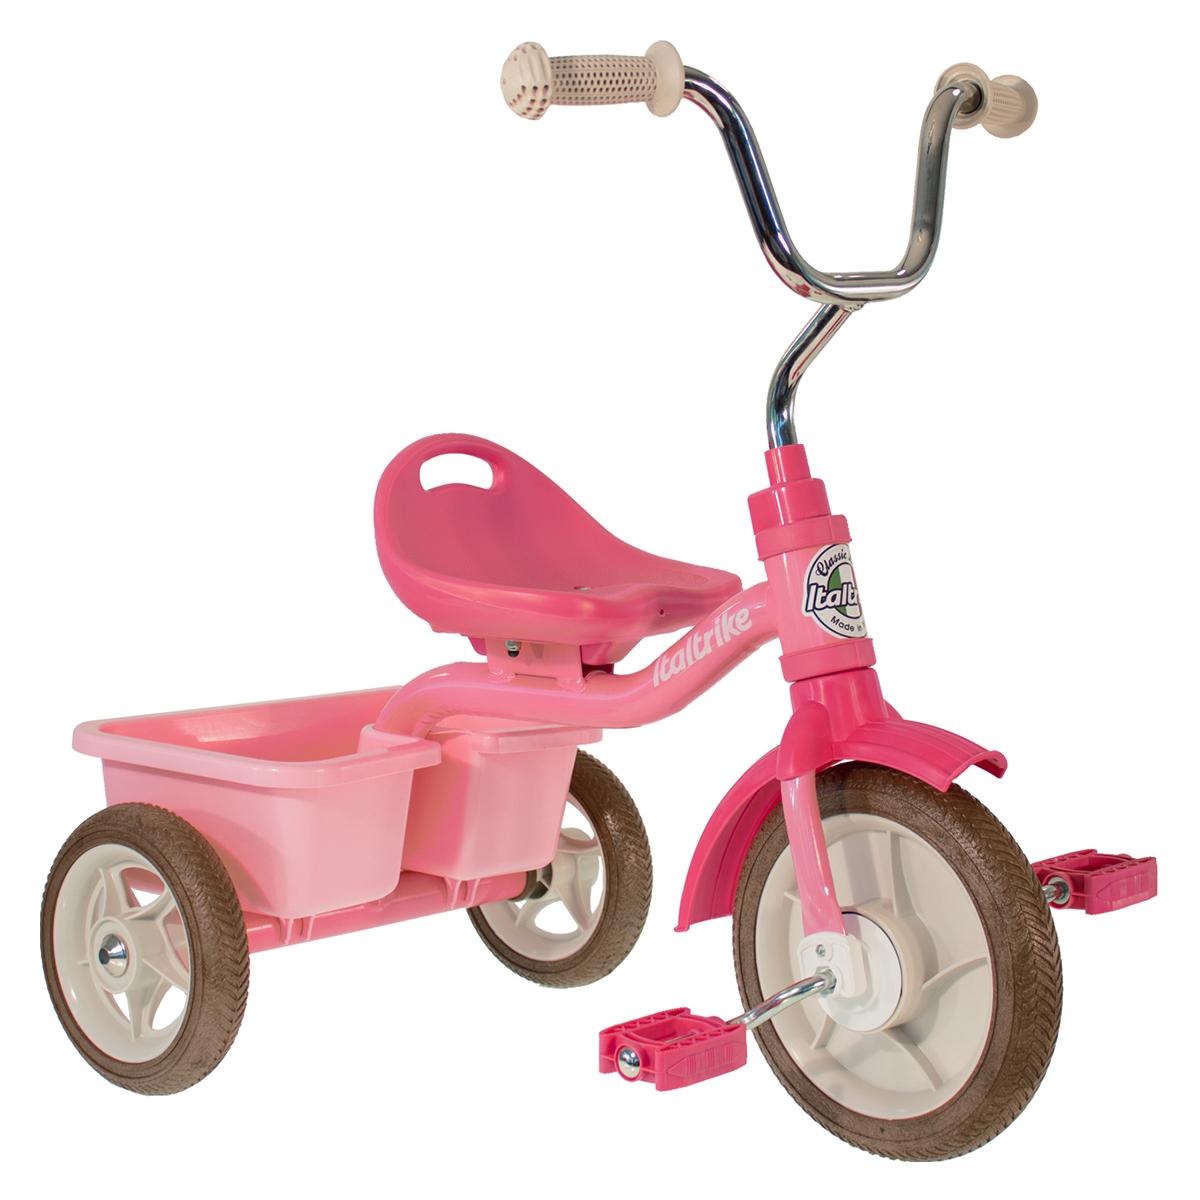 Trotteur & Porteur Tricycle Transporter - Rose Tricycle Transporter - Rose